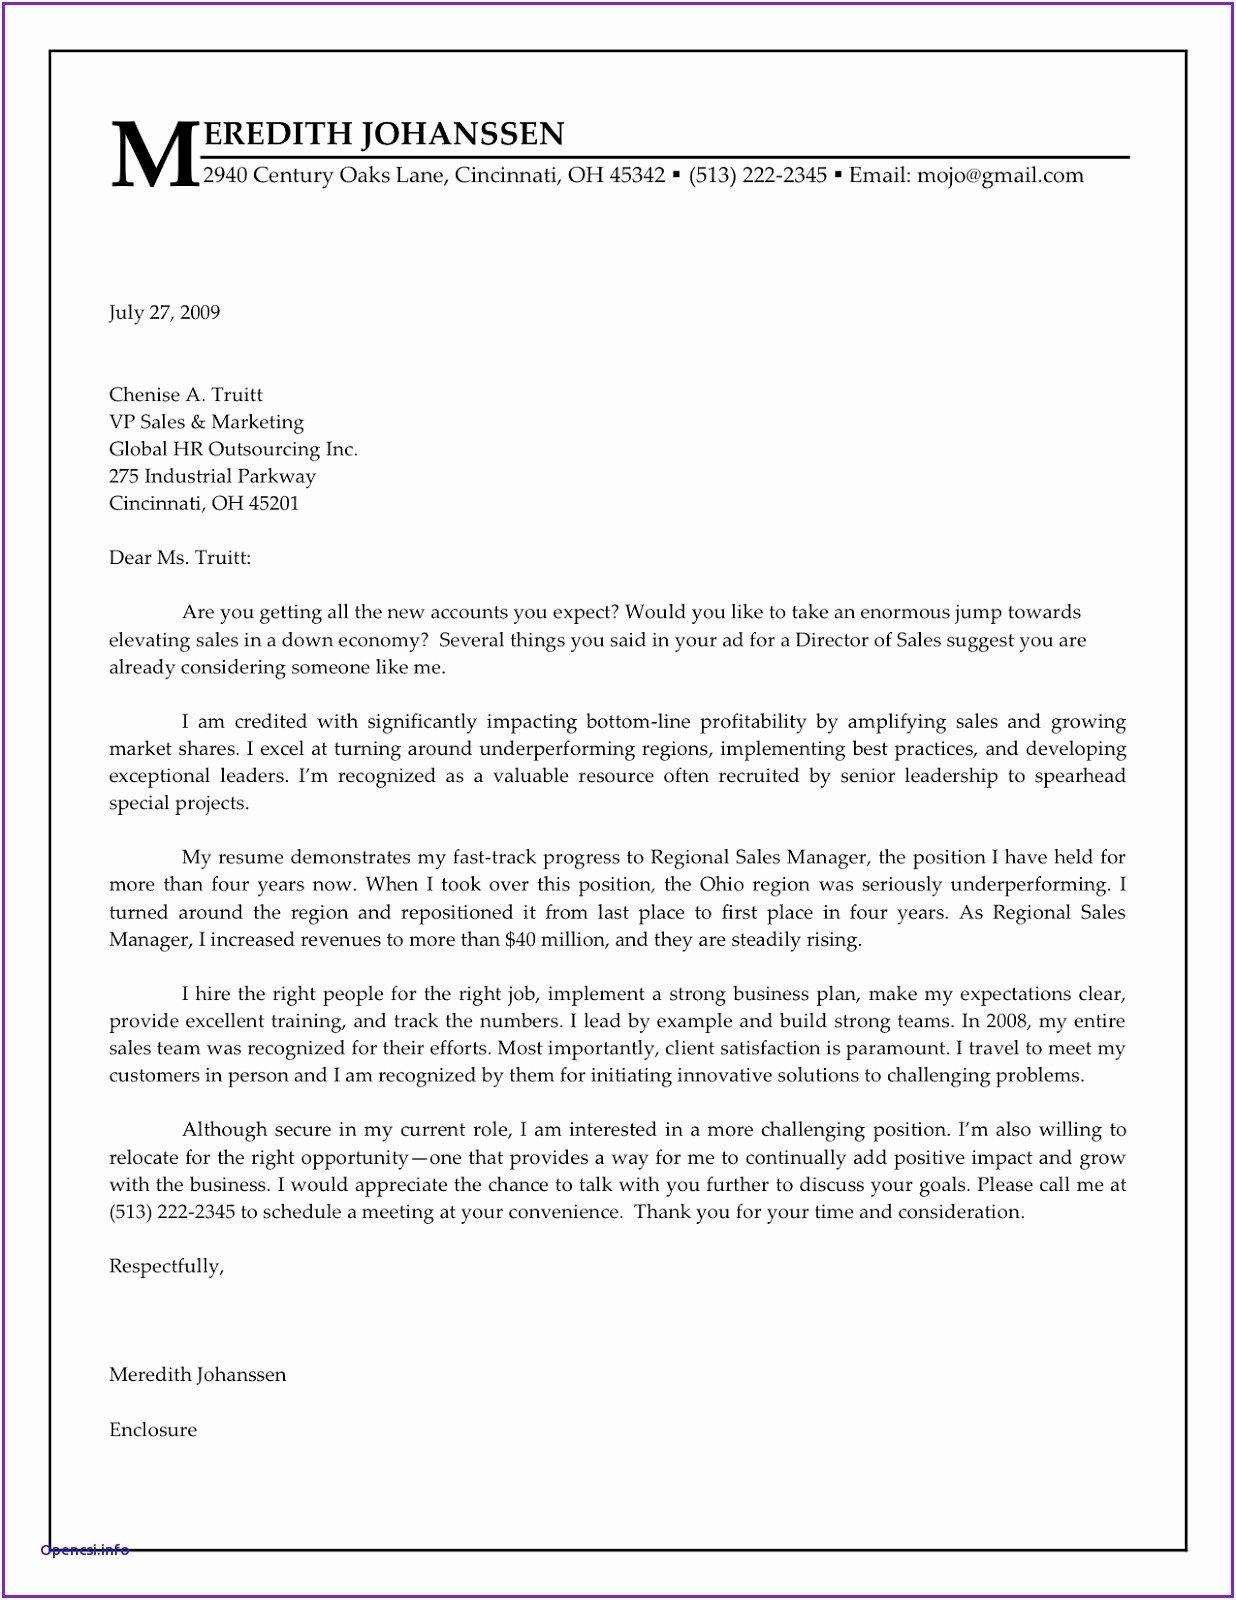 Letter format Google Docs Fresh Business Letter Template for Free New Business Letter